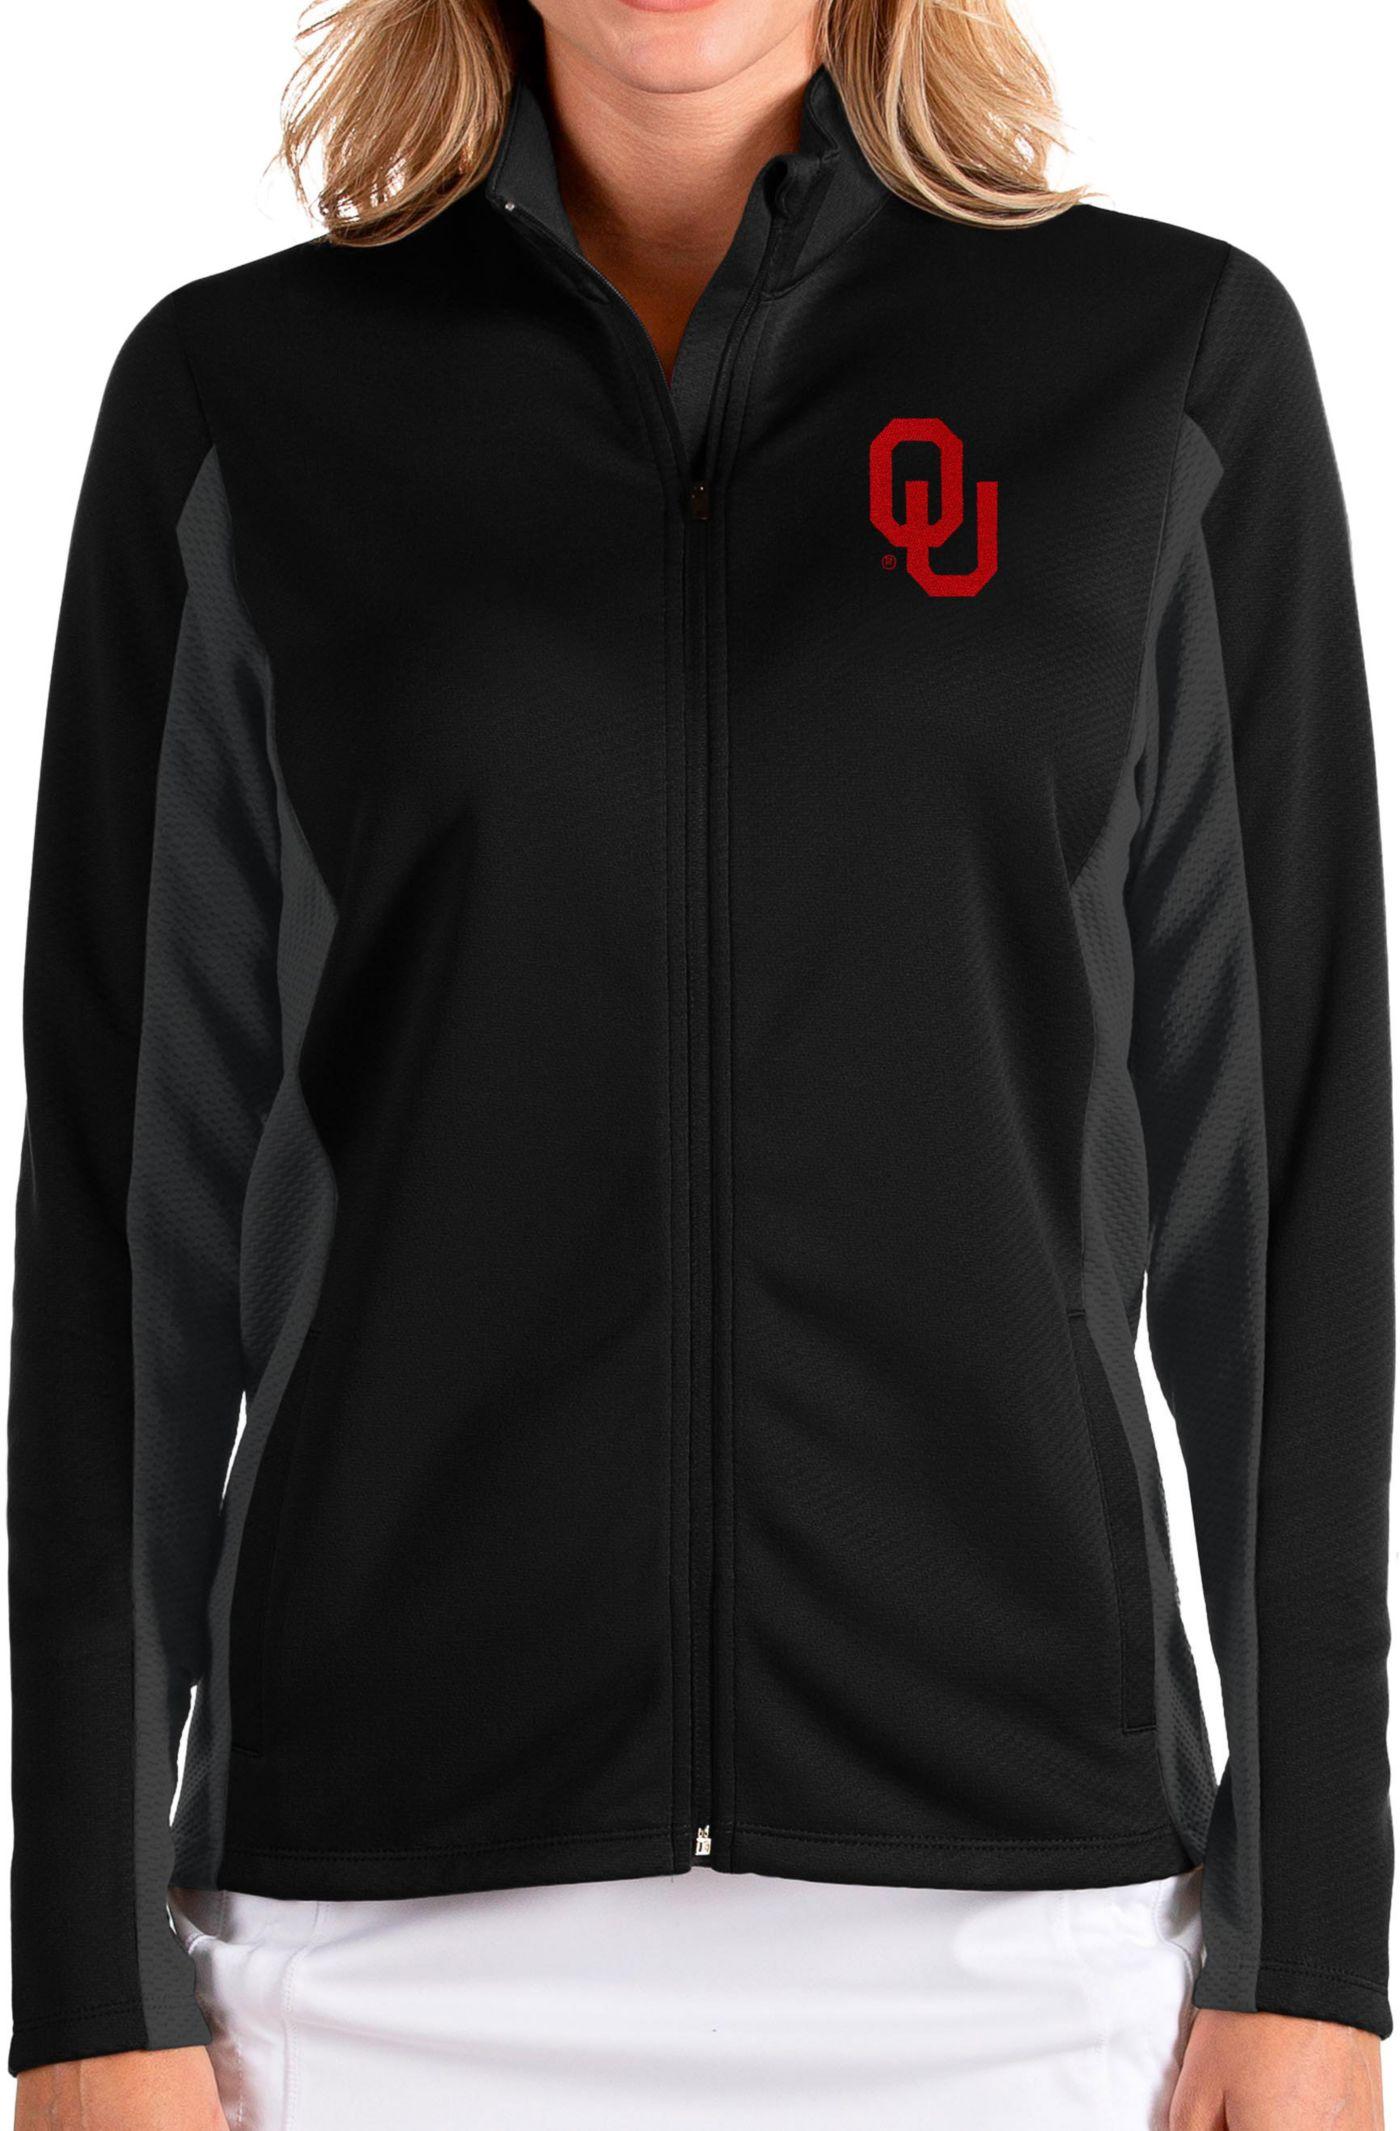 Antigua Women's Oklahoma Sooners Passage Full-Zip Black Jacket